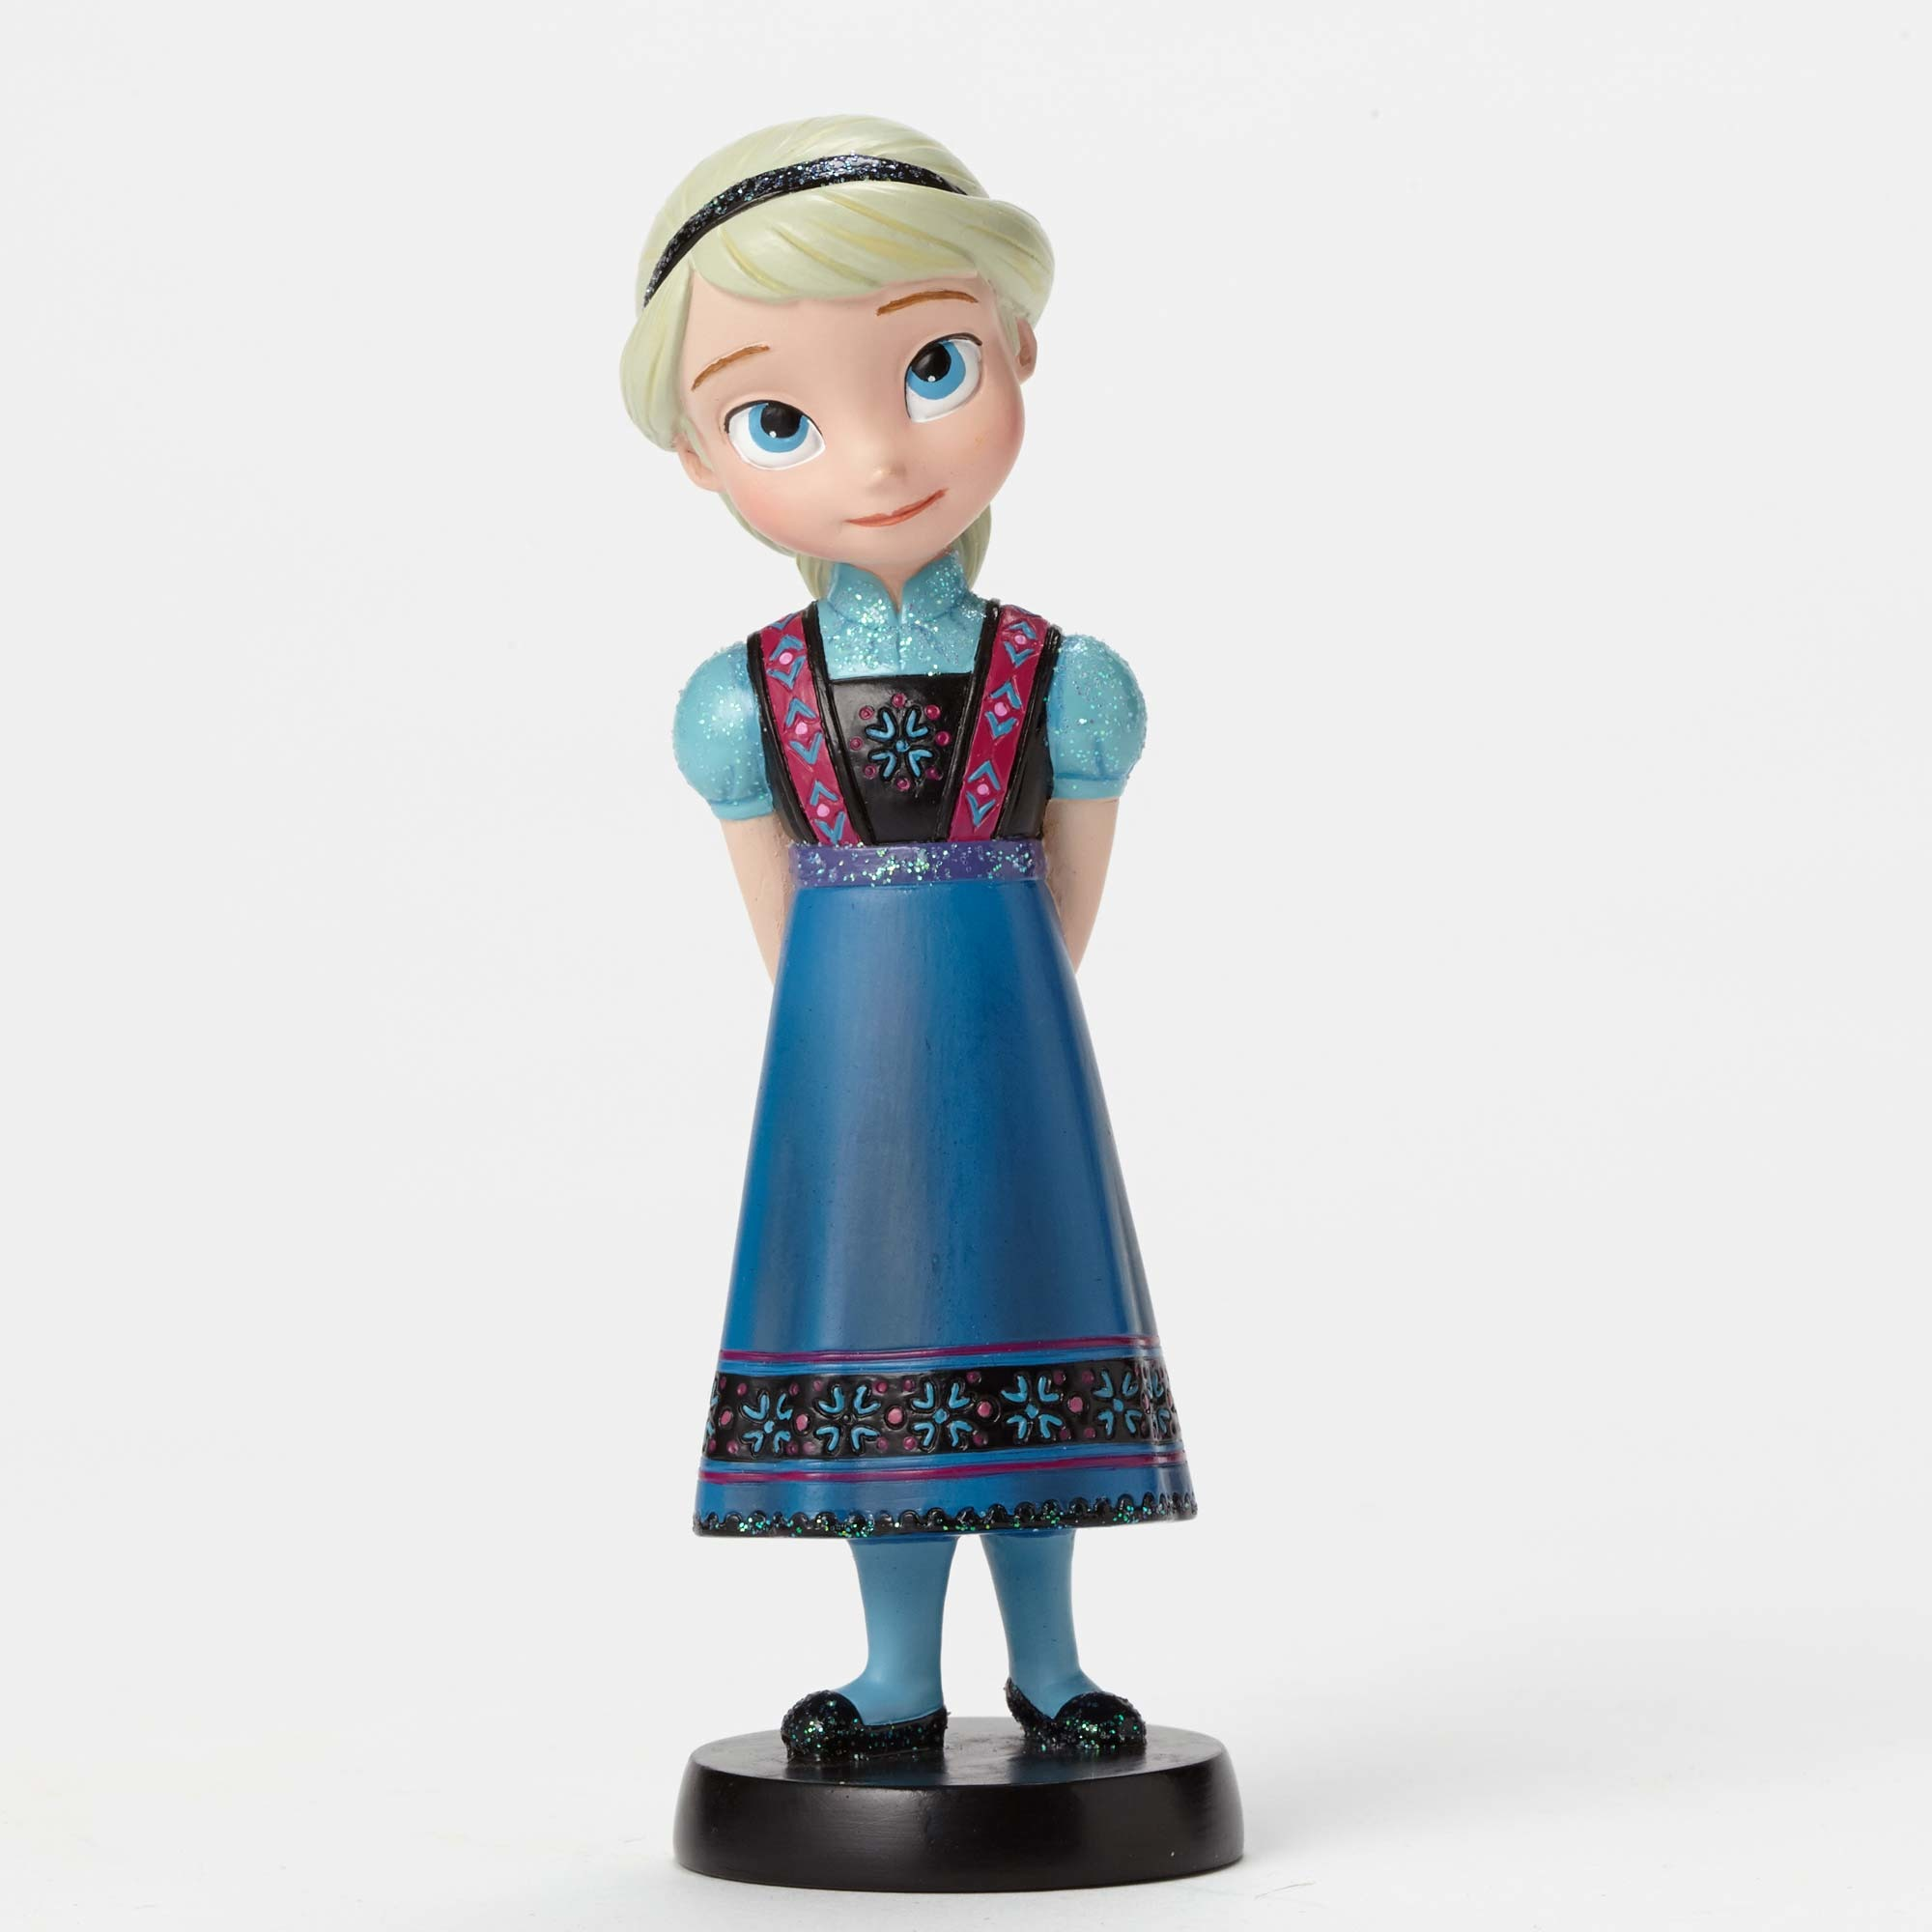 Elsa Child Figurine